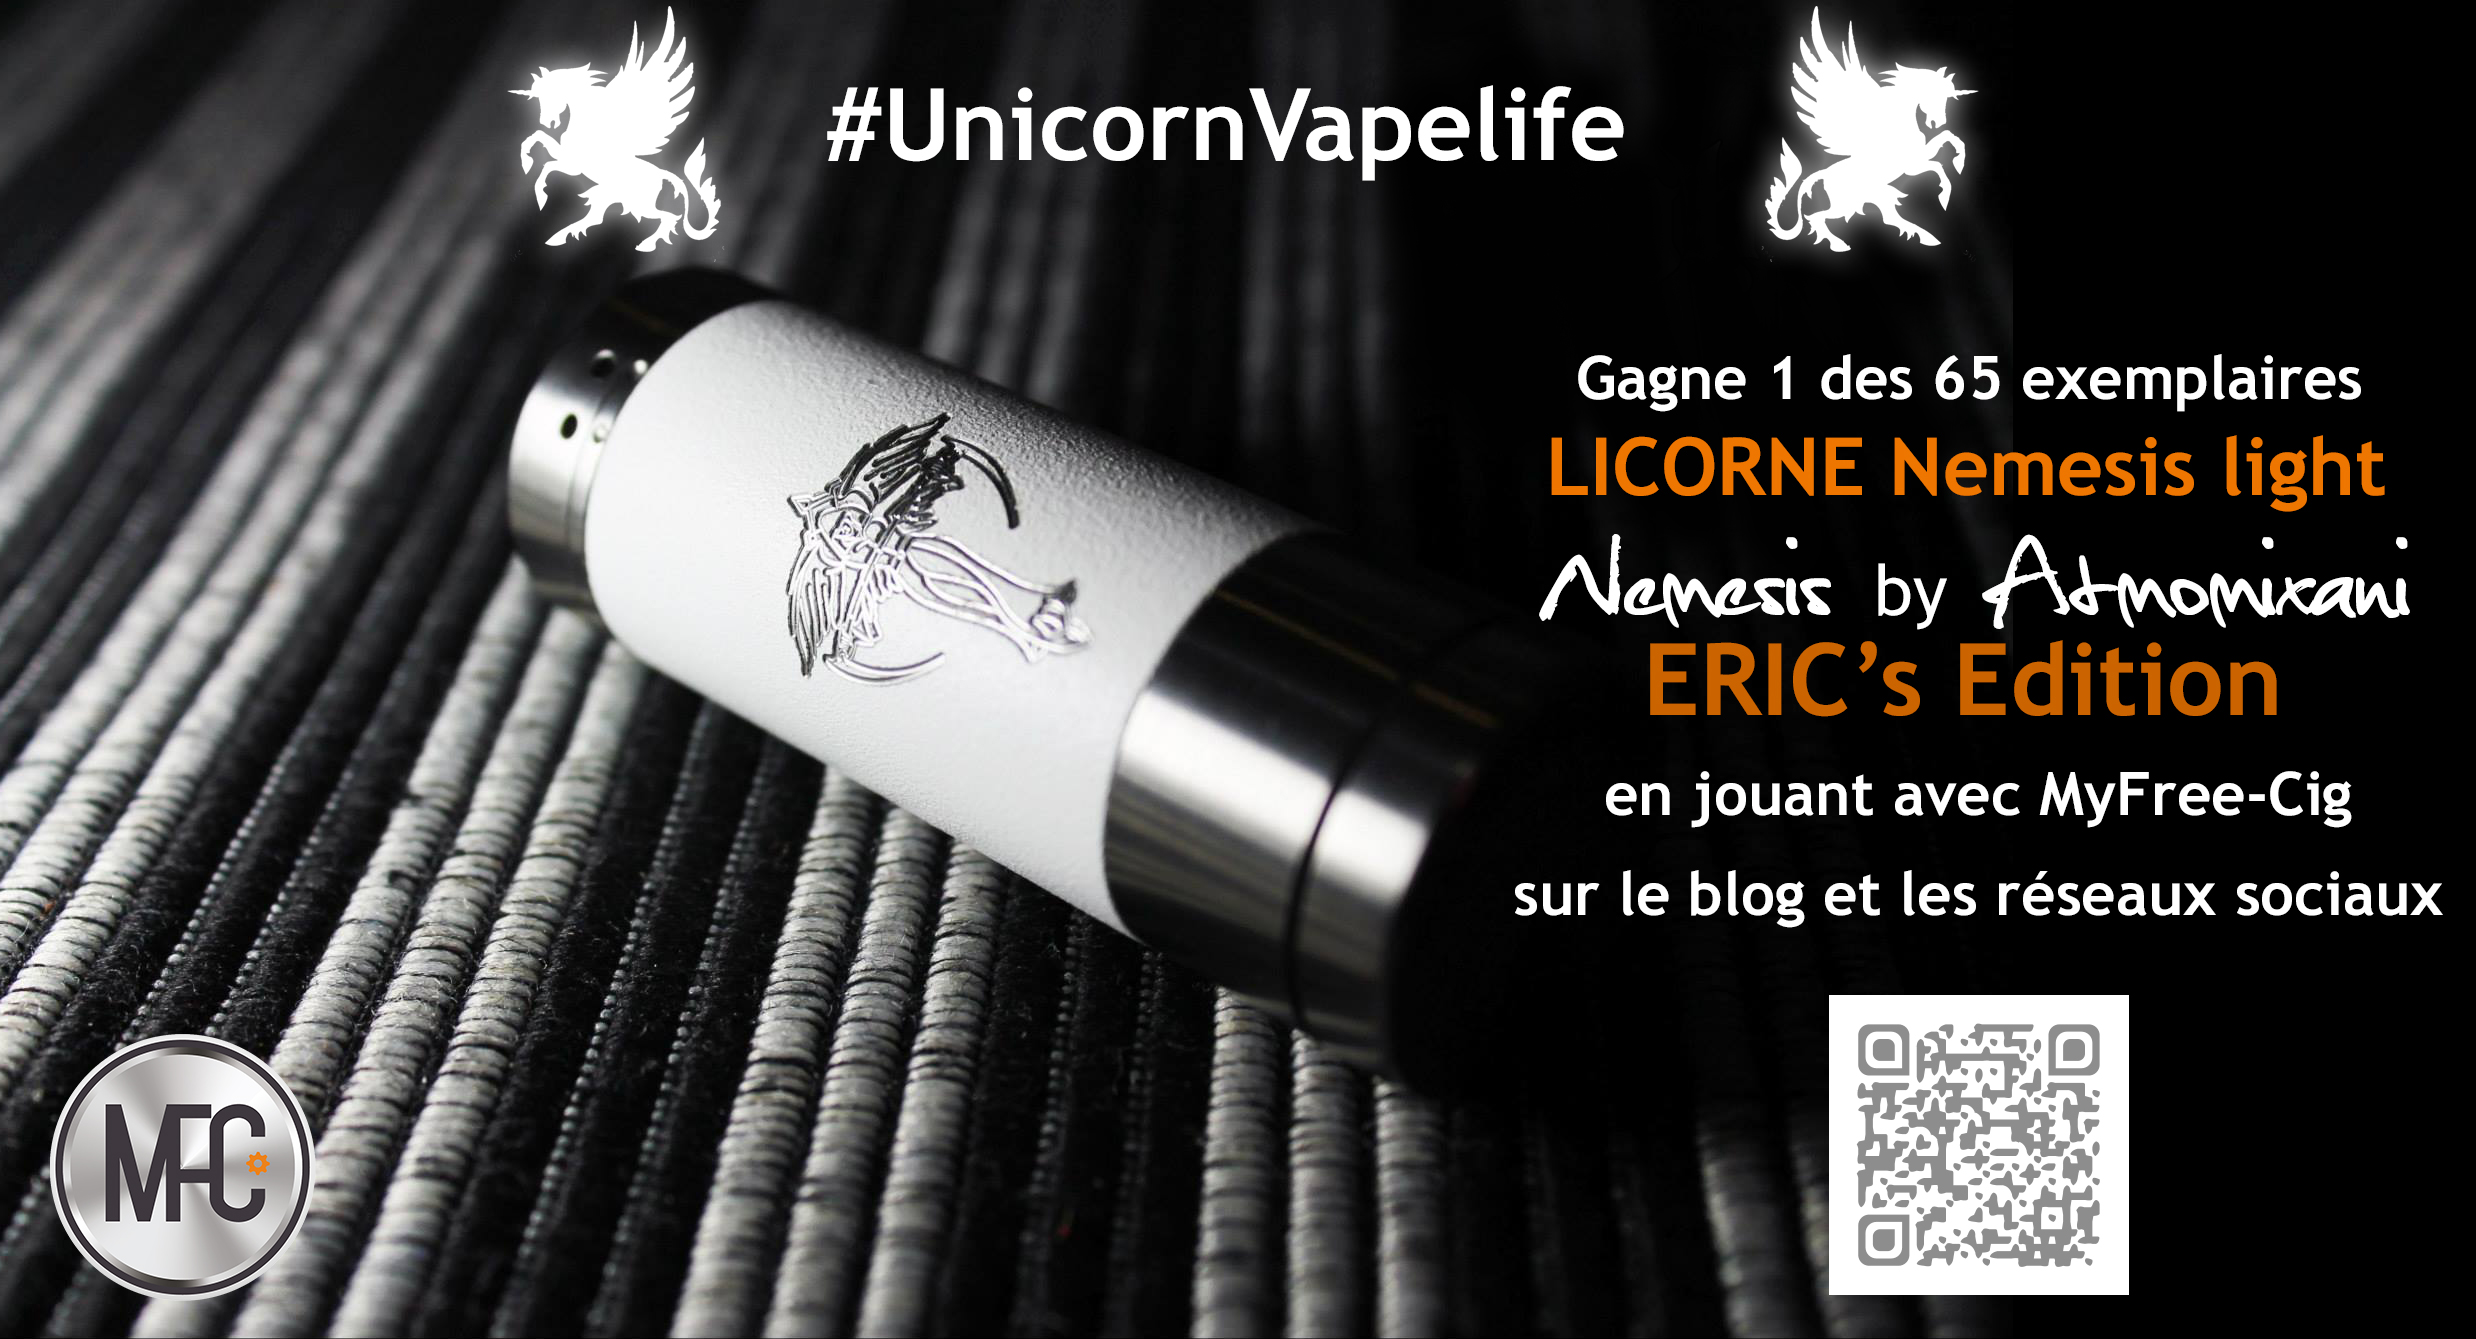 #unicornvapelife